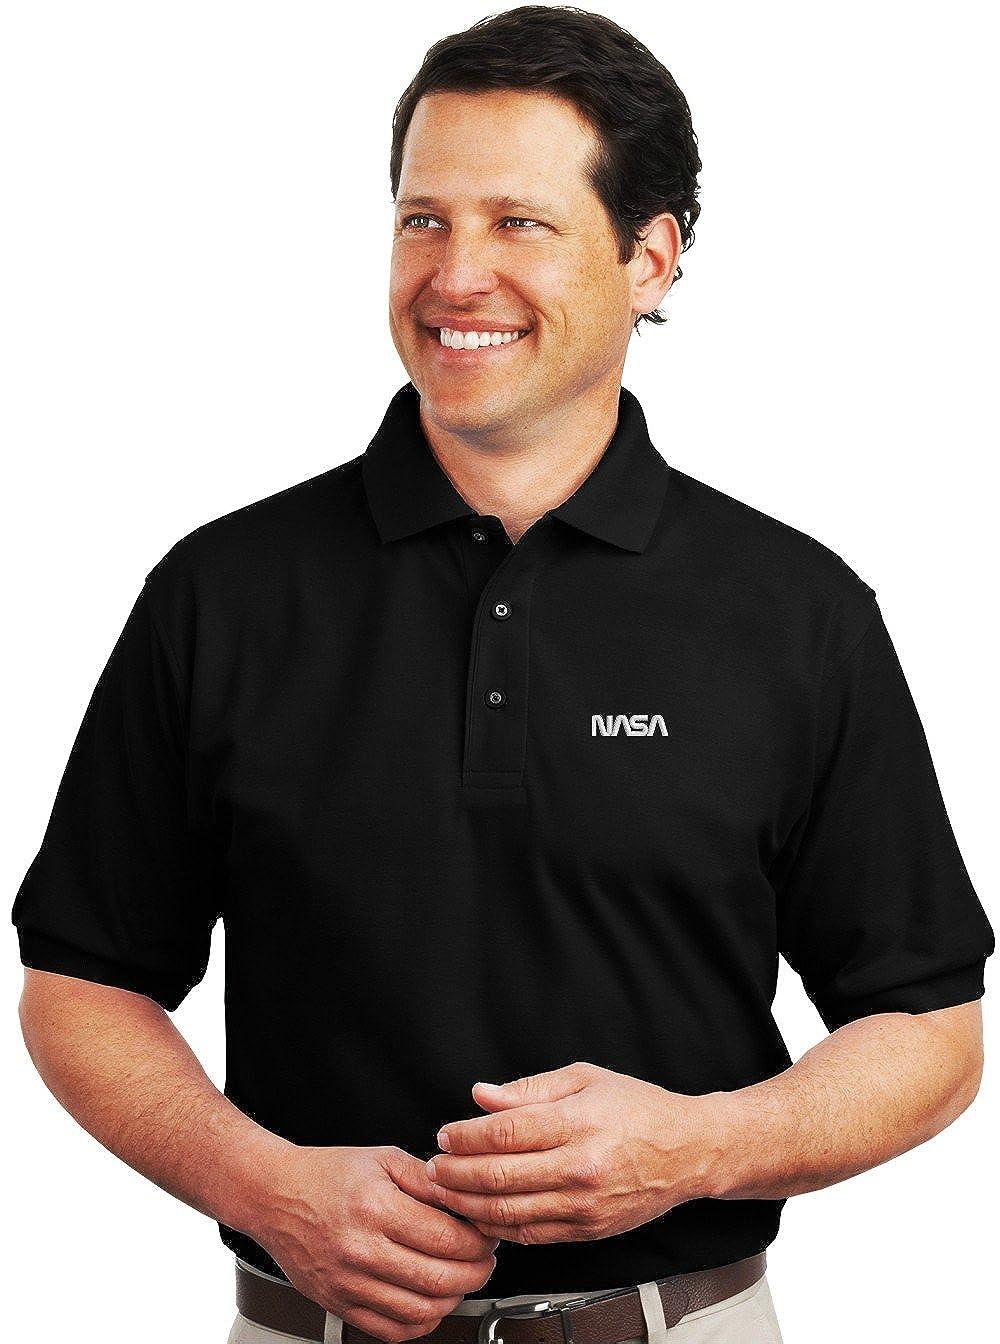 Spiffy Custom Gifts Mens U.S Navy Logo Embroidered Polo Shirt